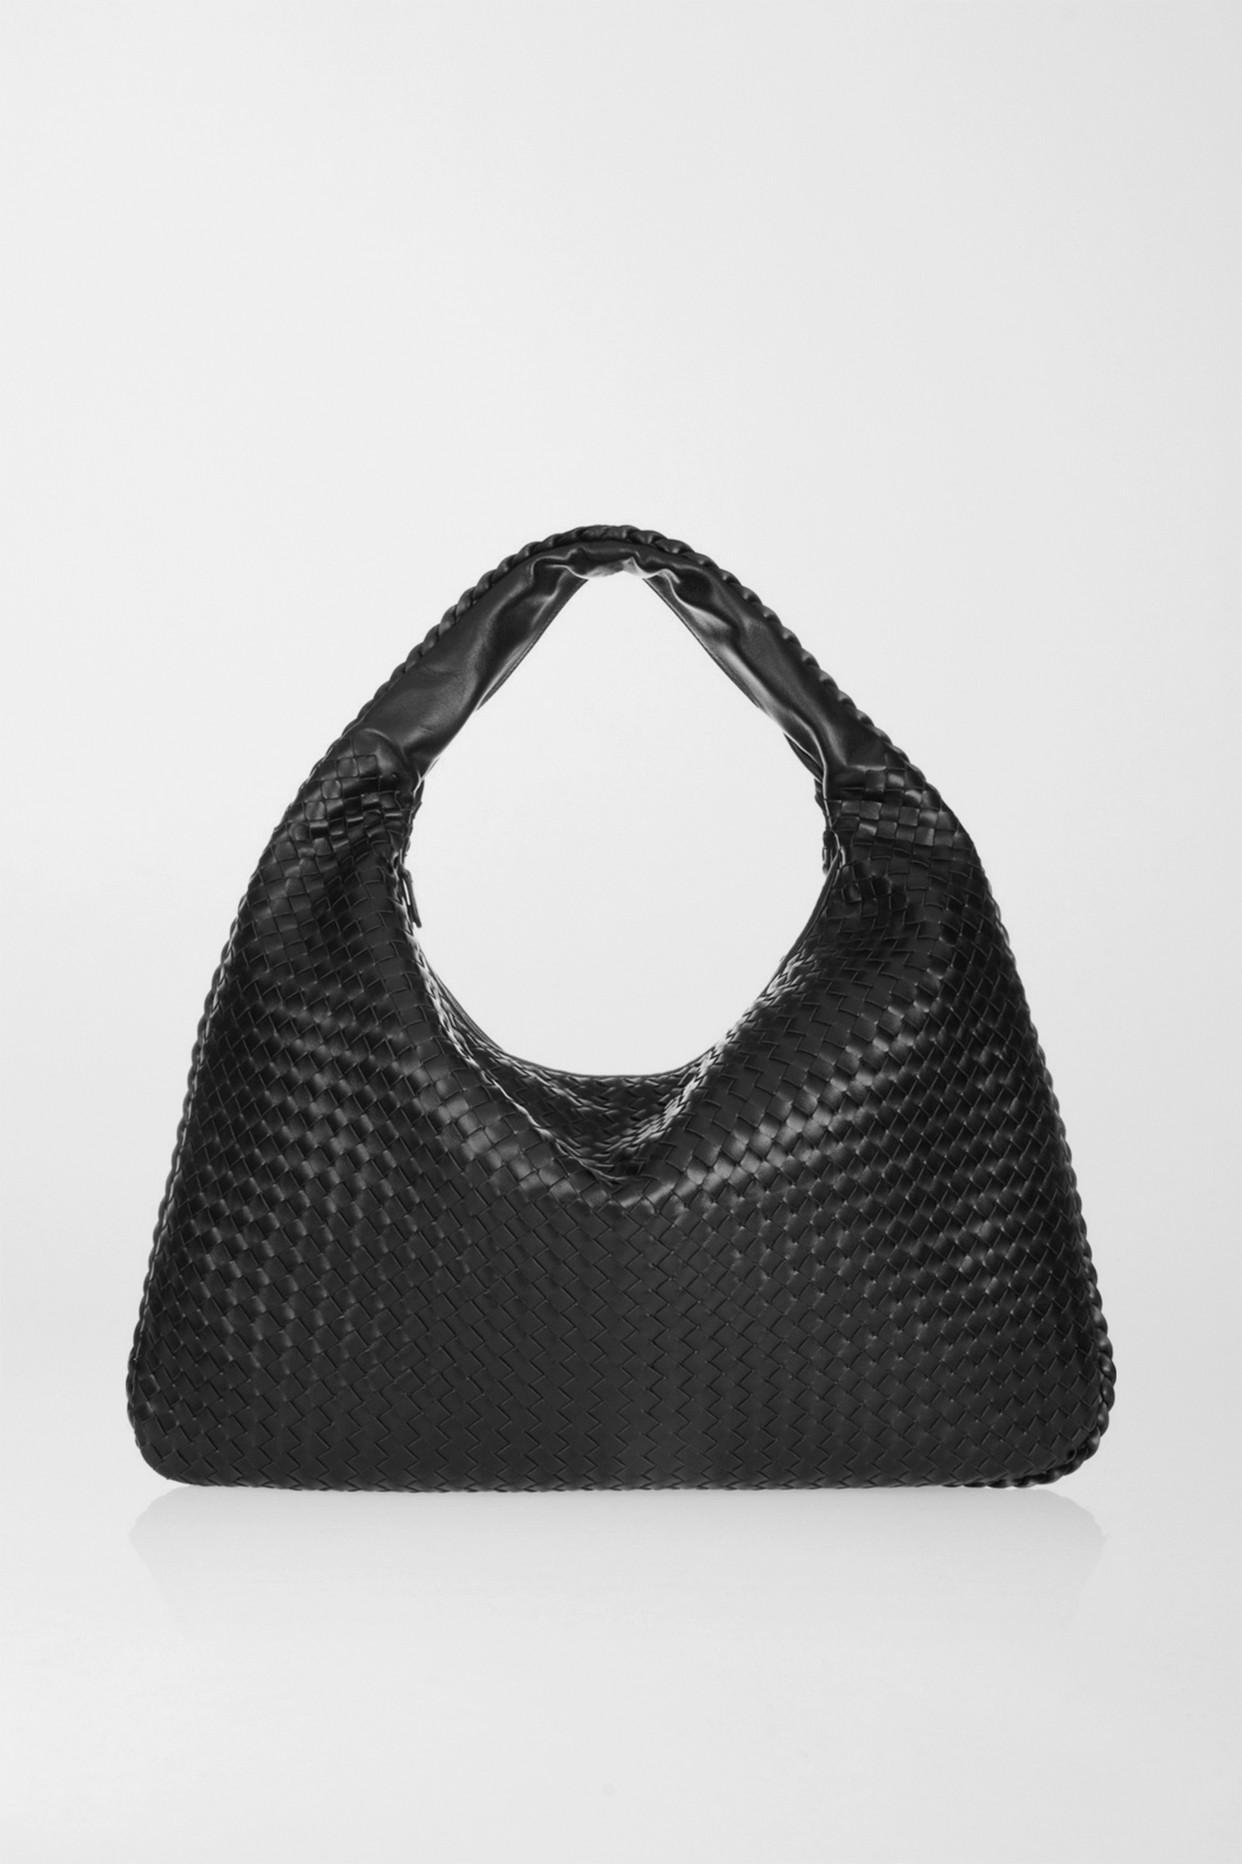 BOTTEGA VENETA - Maxi Veneta Intrecciato 皮革单肩包 - 黑色 - one size